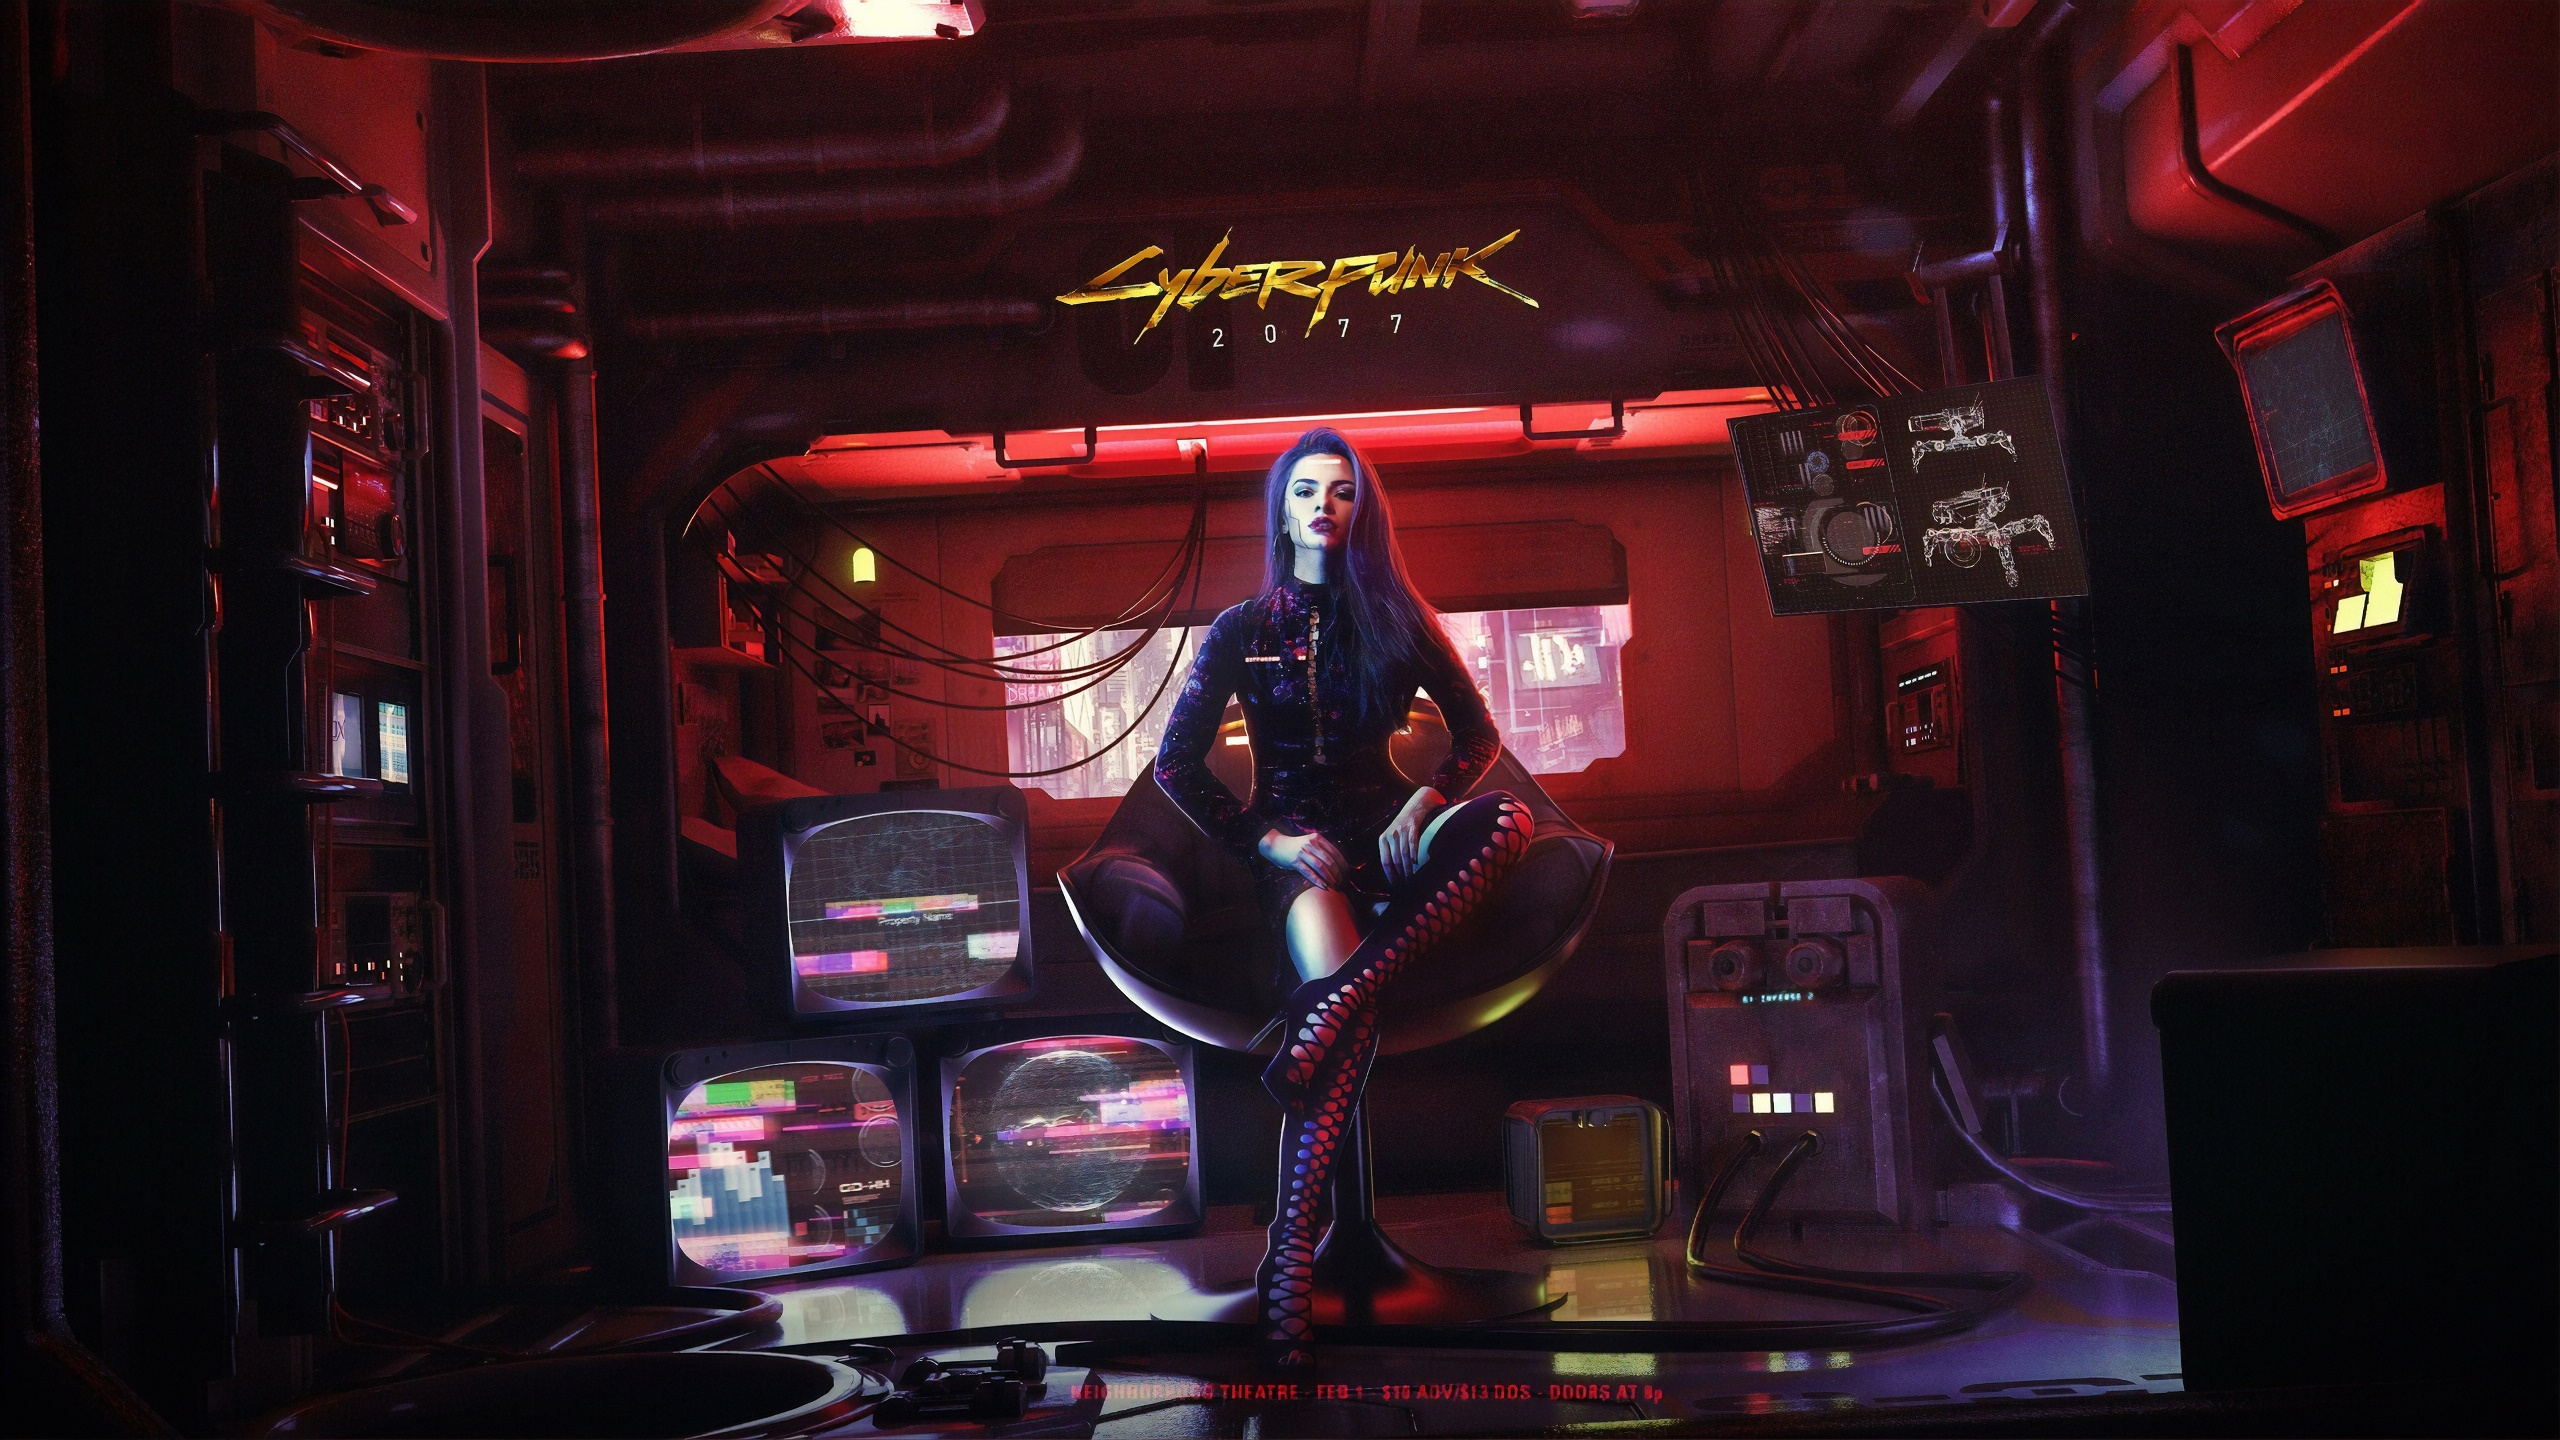 General 2560x1440 Cyberpunk 2077 futuristic women sitting TV digital art cyberpunk frontal view